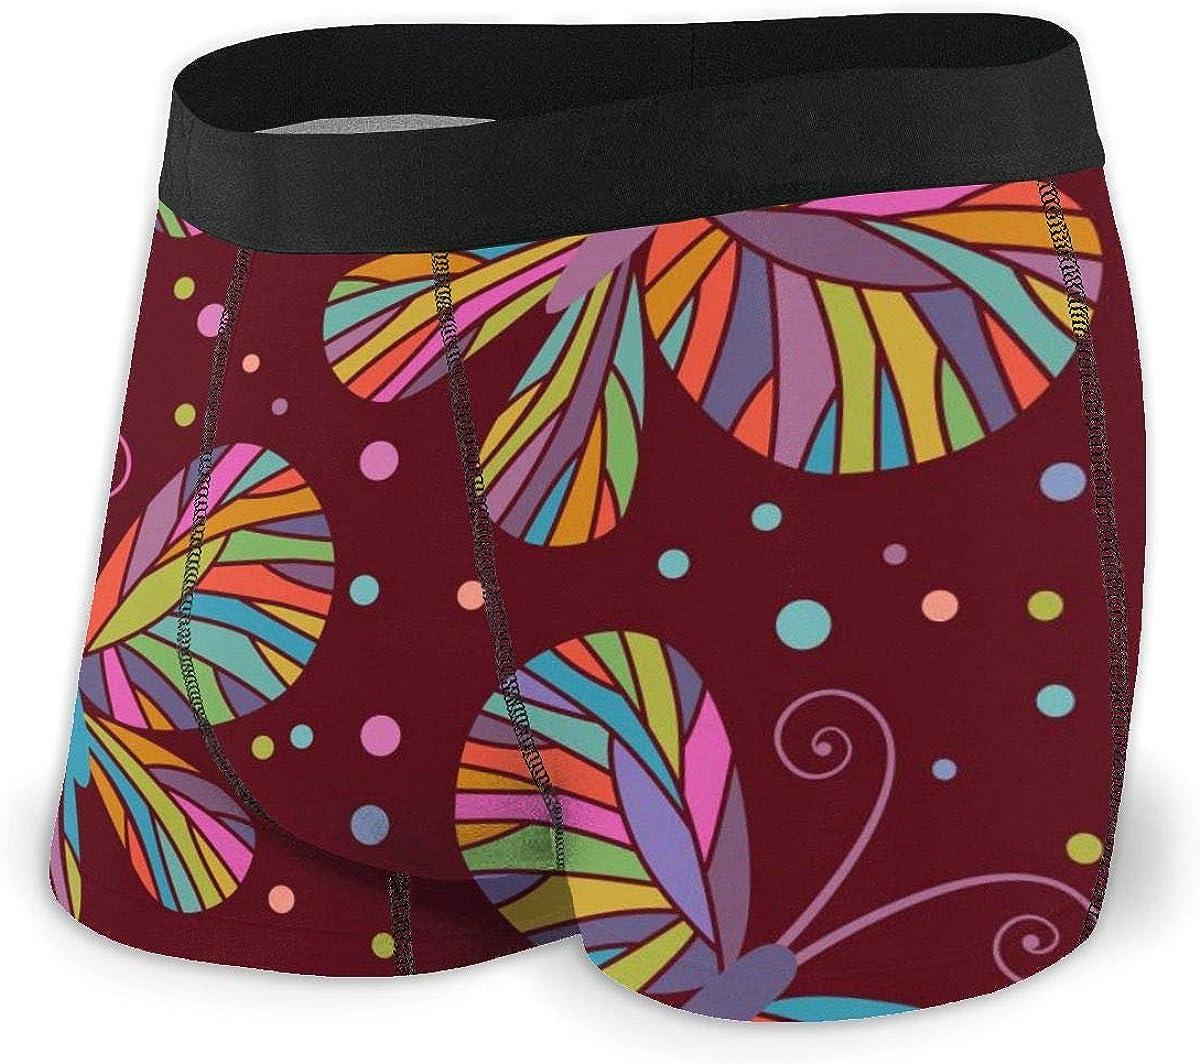 Randolph Wordsworth Mens Boxer Briefs Burgundy Color Butterflies Low Rise Trunks Breathable Bikini Underpants Boys Underwear